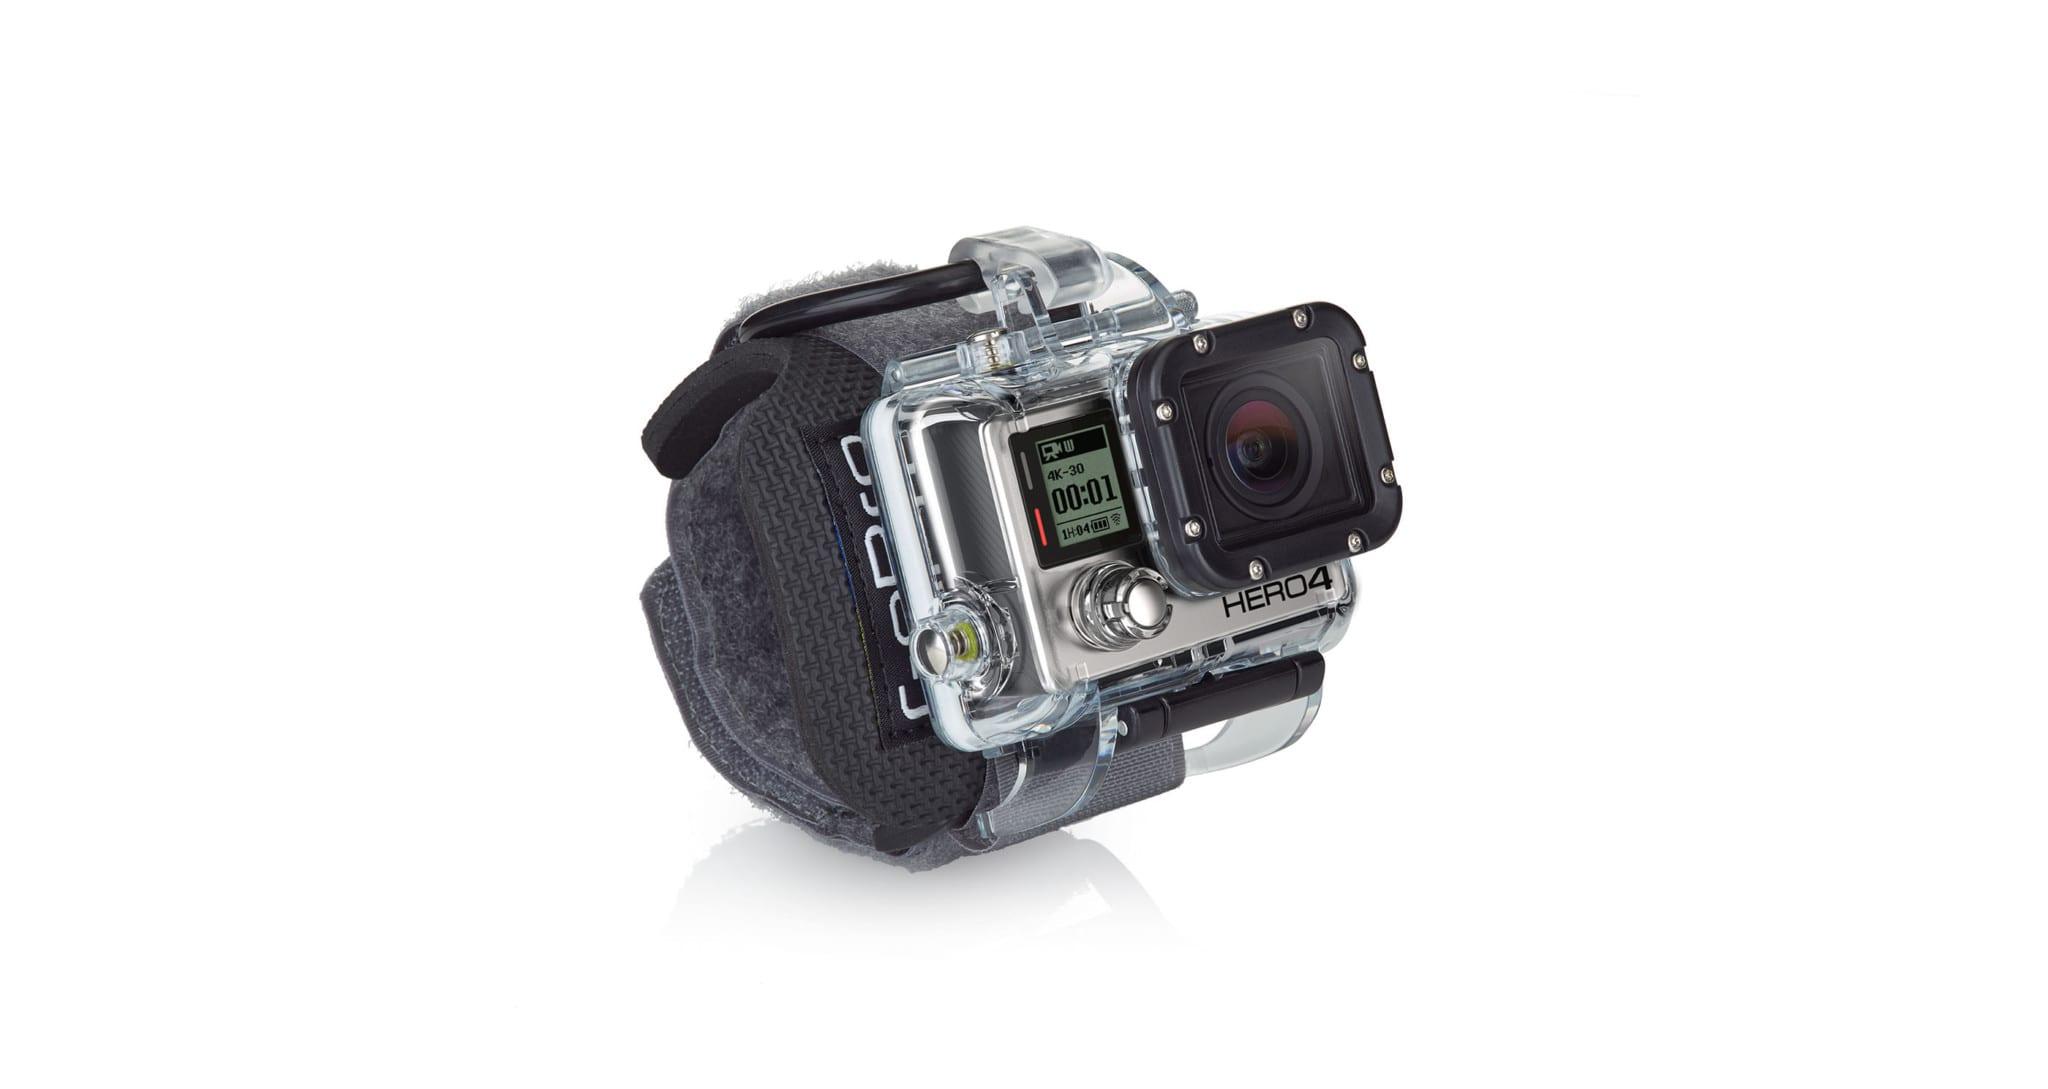 GoPro Wrist Housing Image from GoPro.com